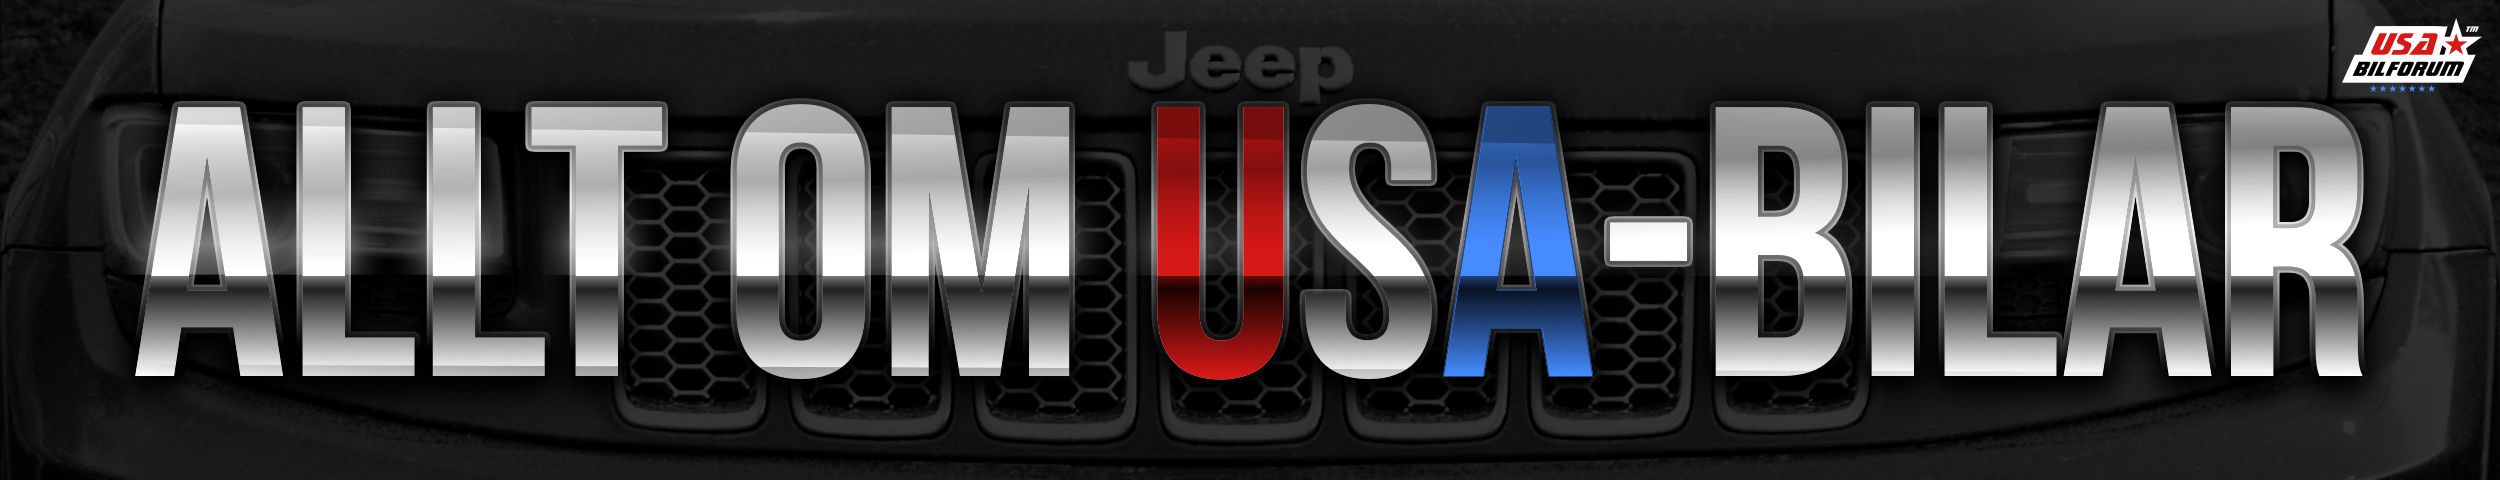 USAbilforum - Allt om USA-bilar